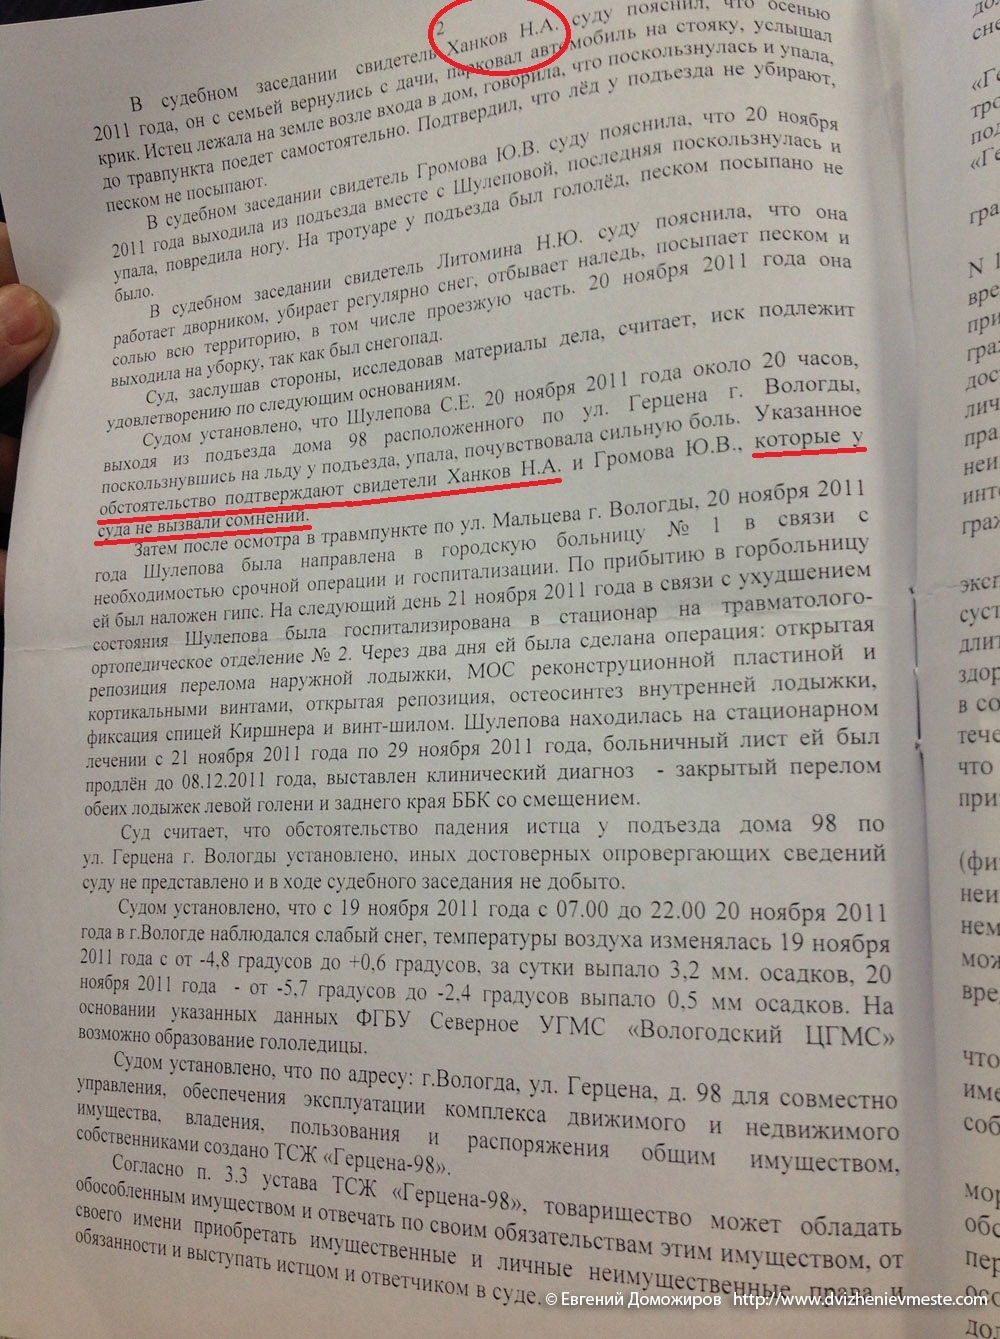 Решение суда по Светлане Шулеповой